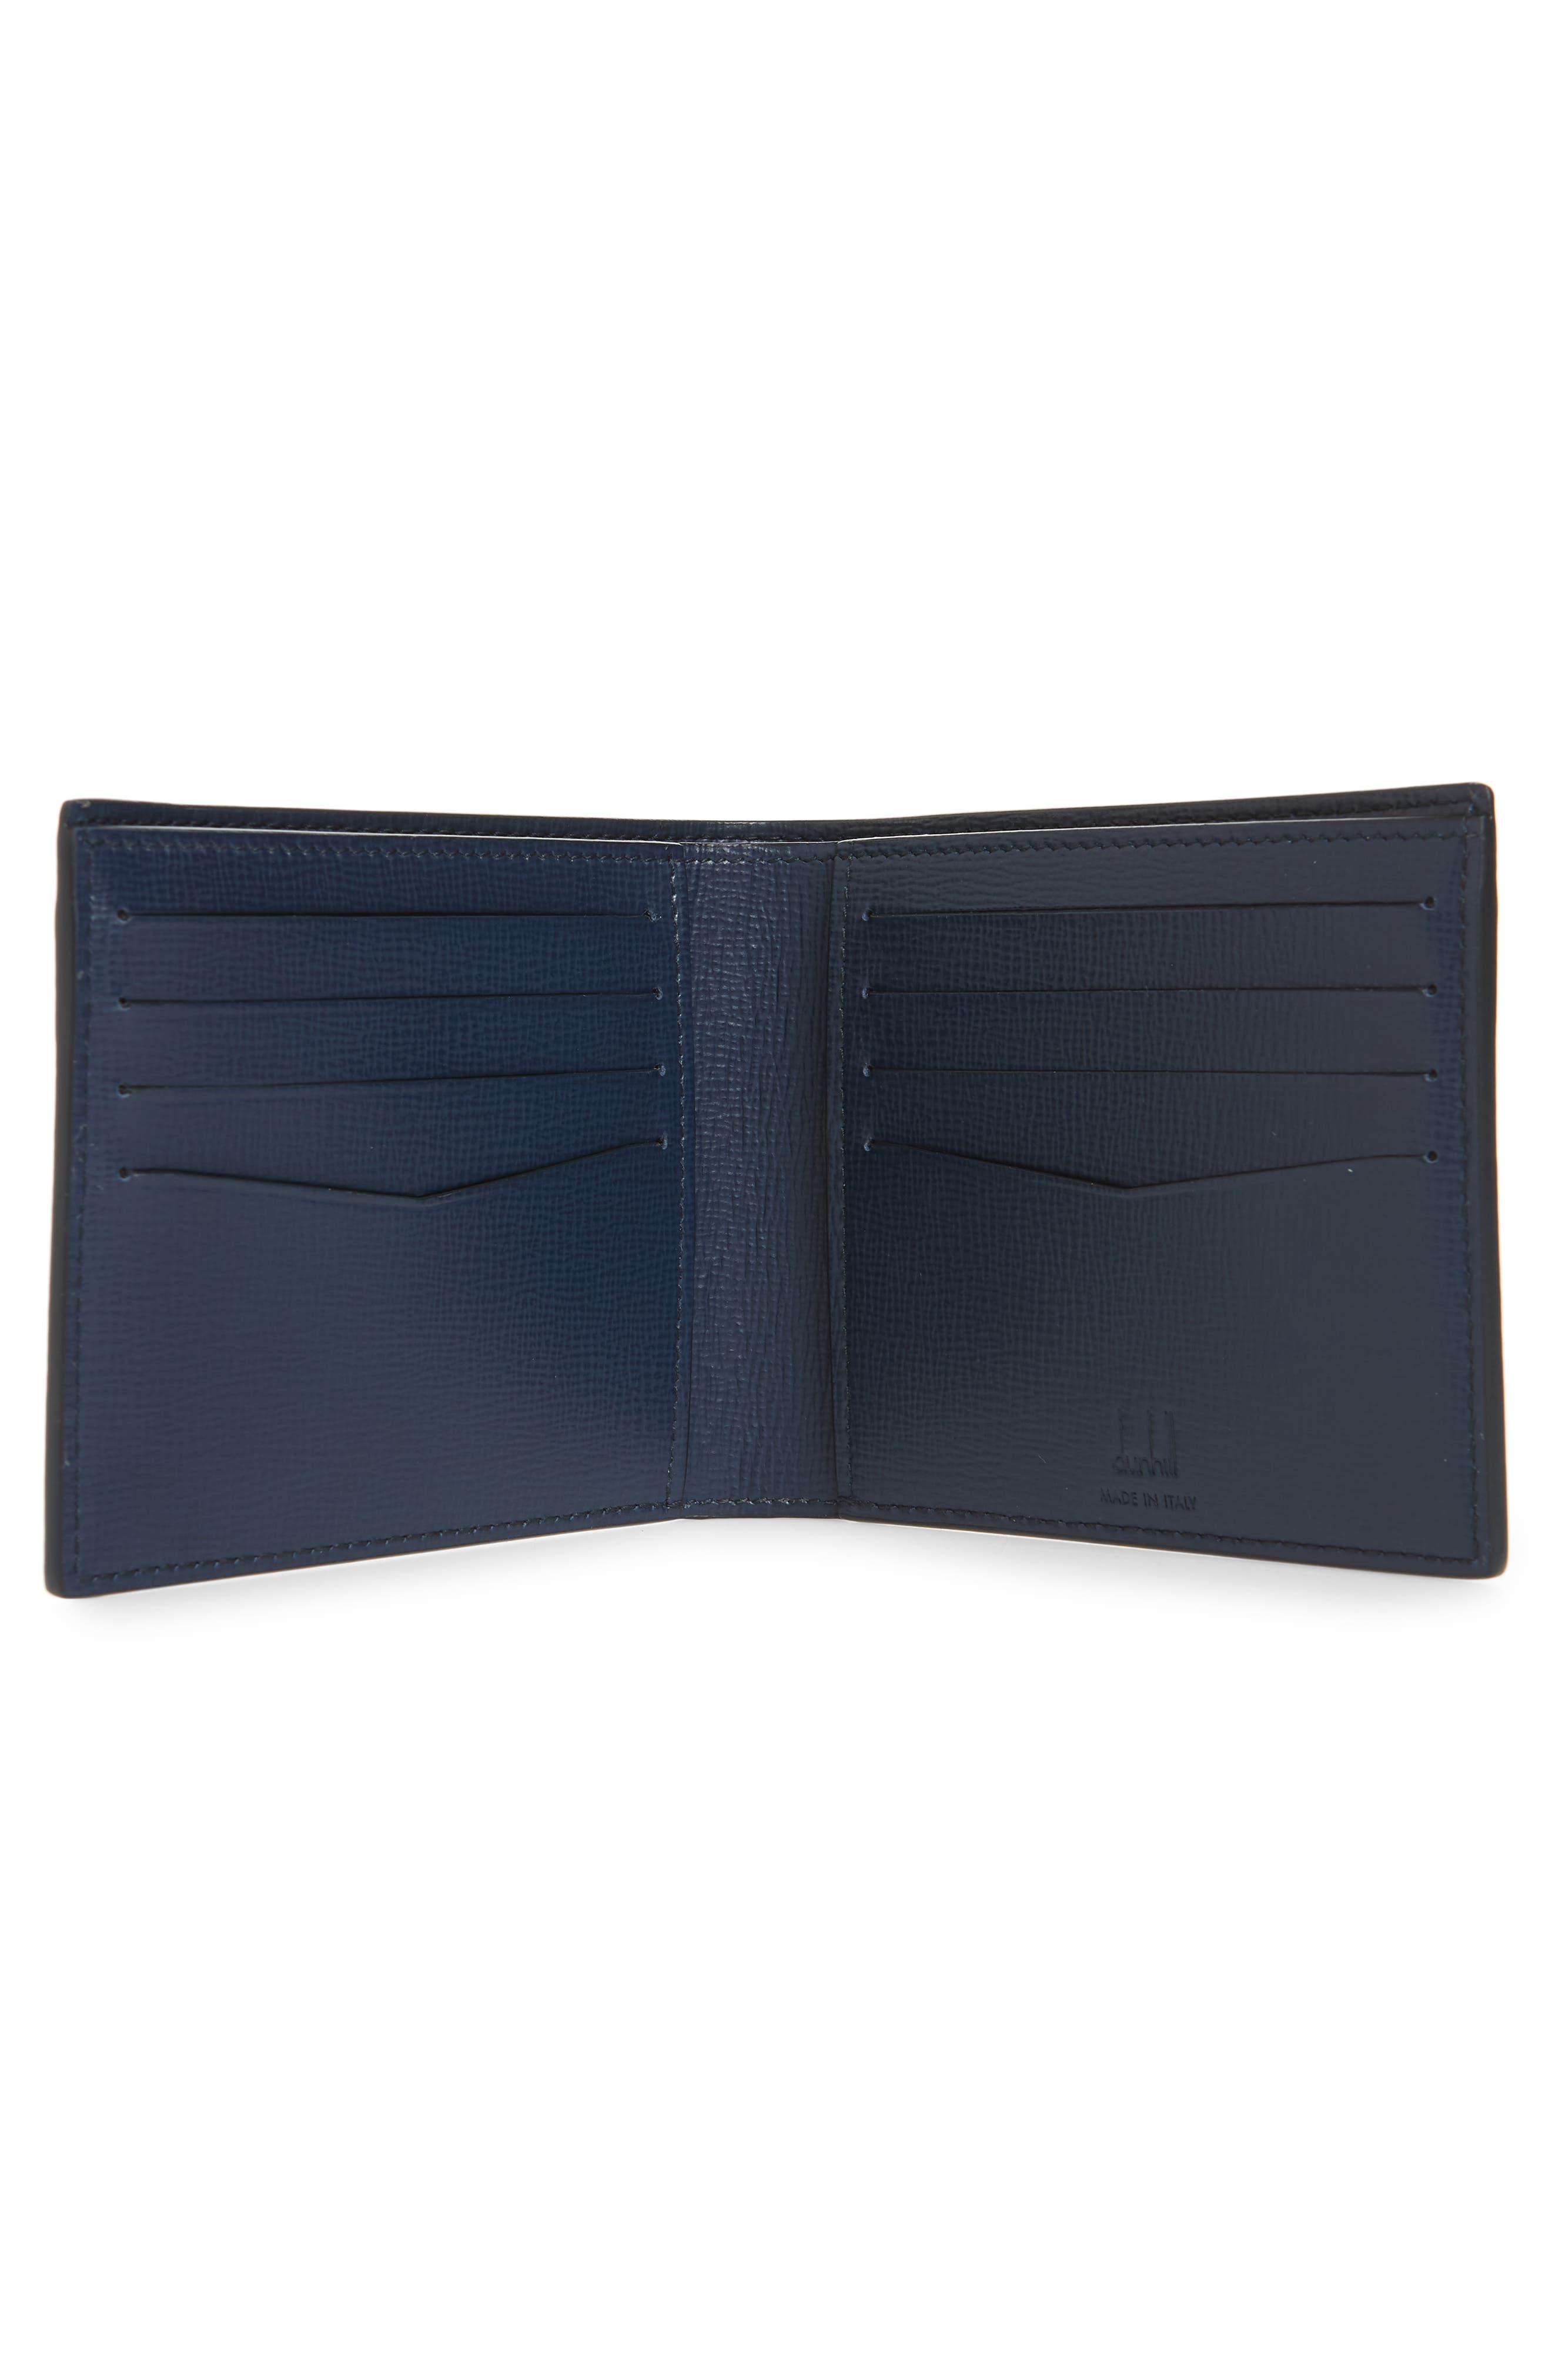 Cadogan Leather Wallet,                             Alternate thumbnail 2, color,                             BLUE